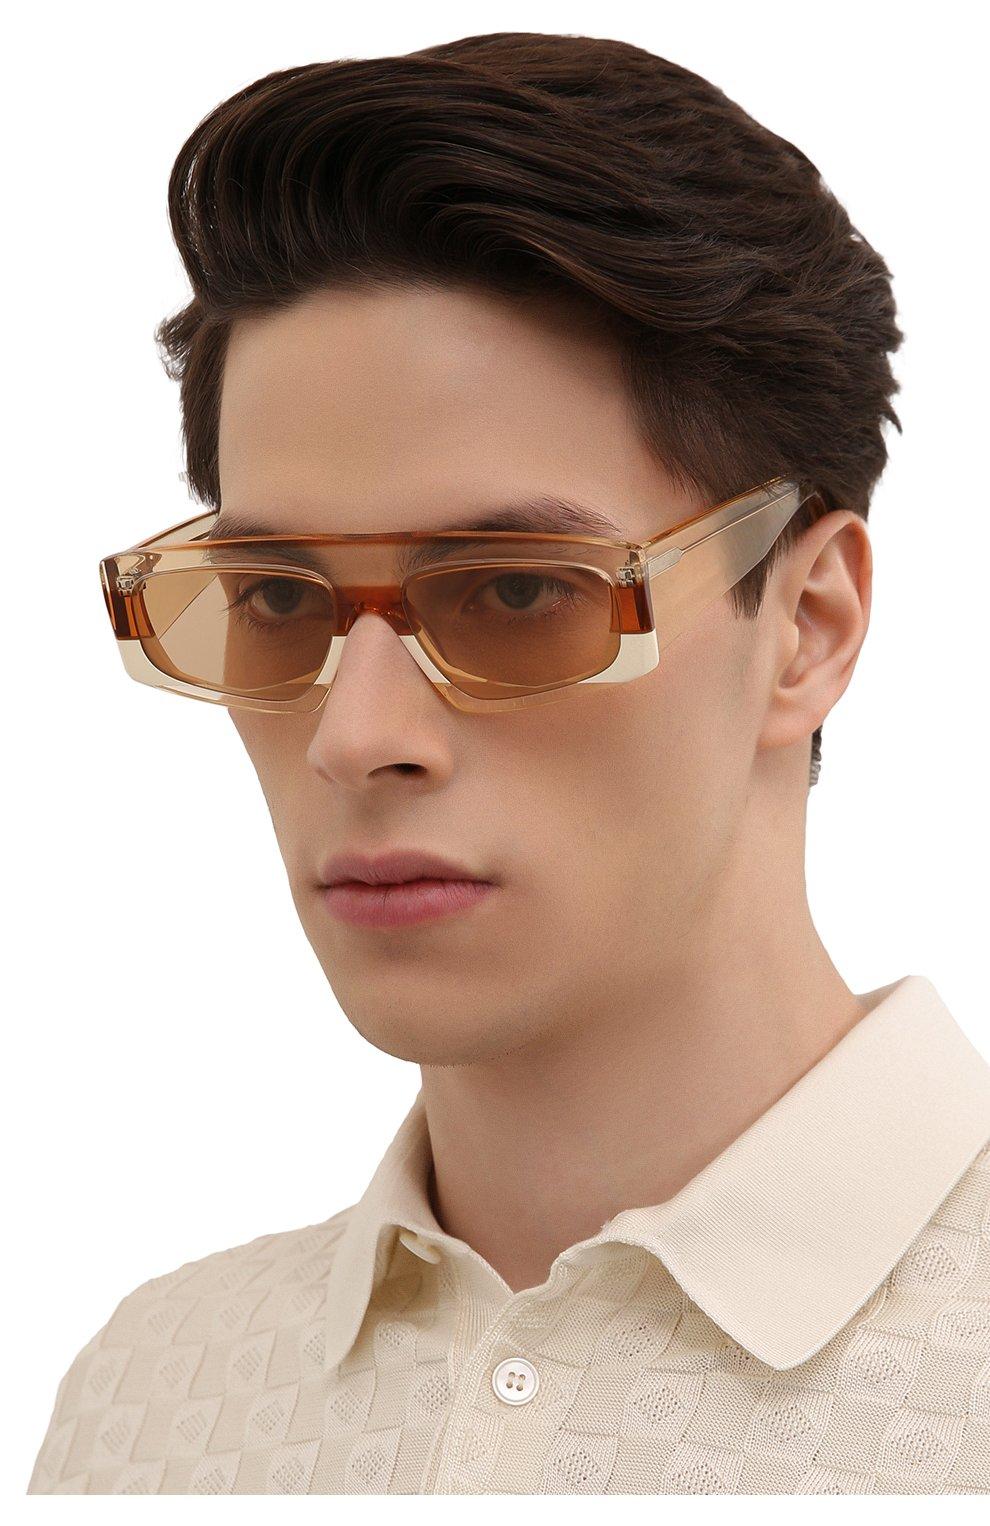 Женские солнцезащитные очки JACQUEMUS оранжевого цвета, арт. LES LUNETTES YAUC0 SHADE 0F 0RANGE | Фото 3